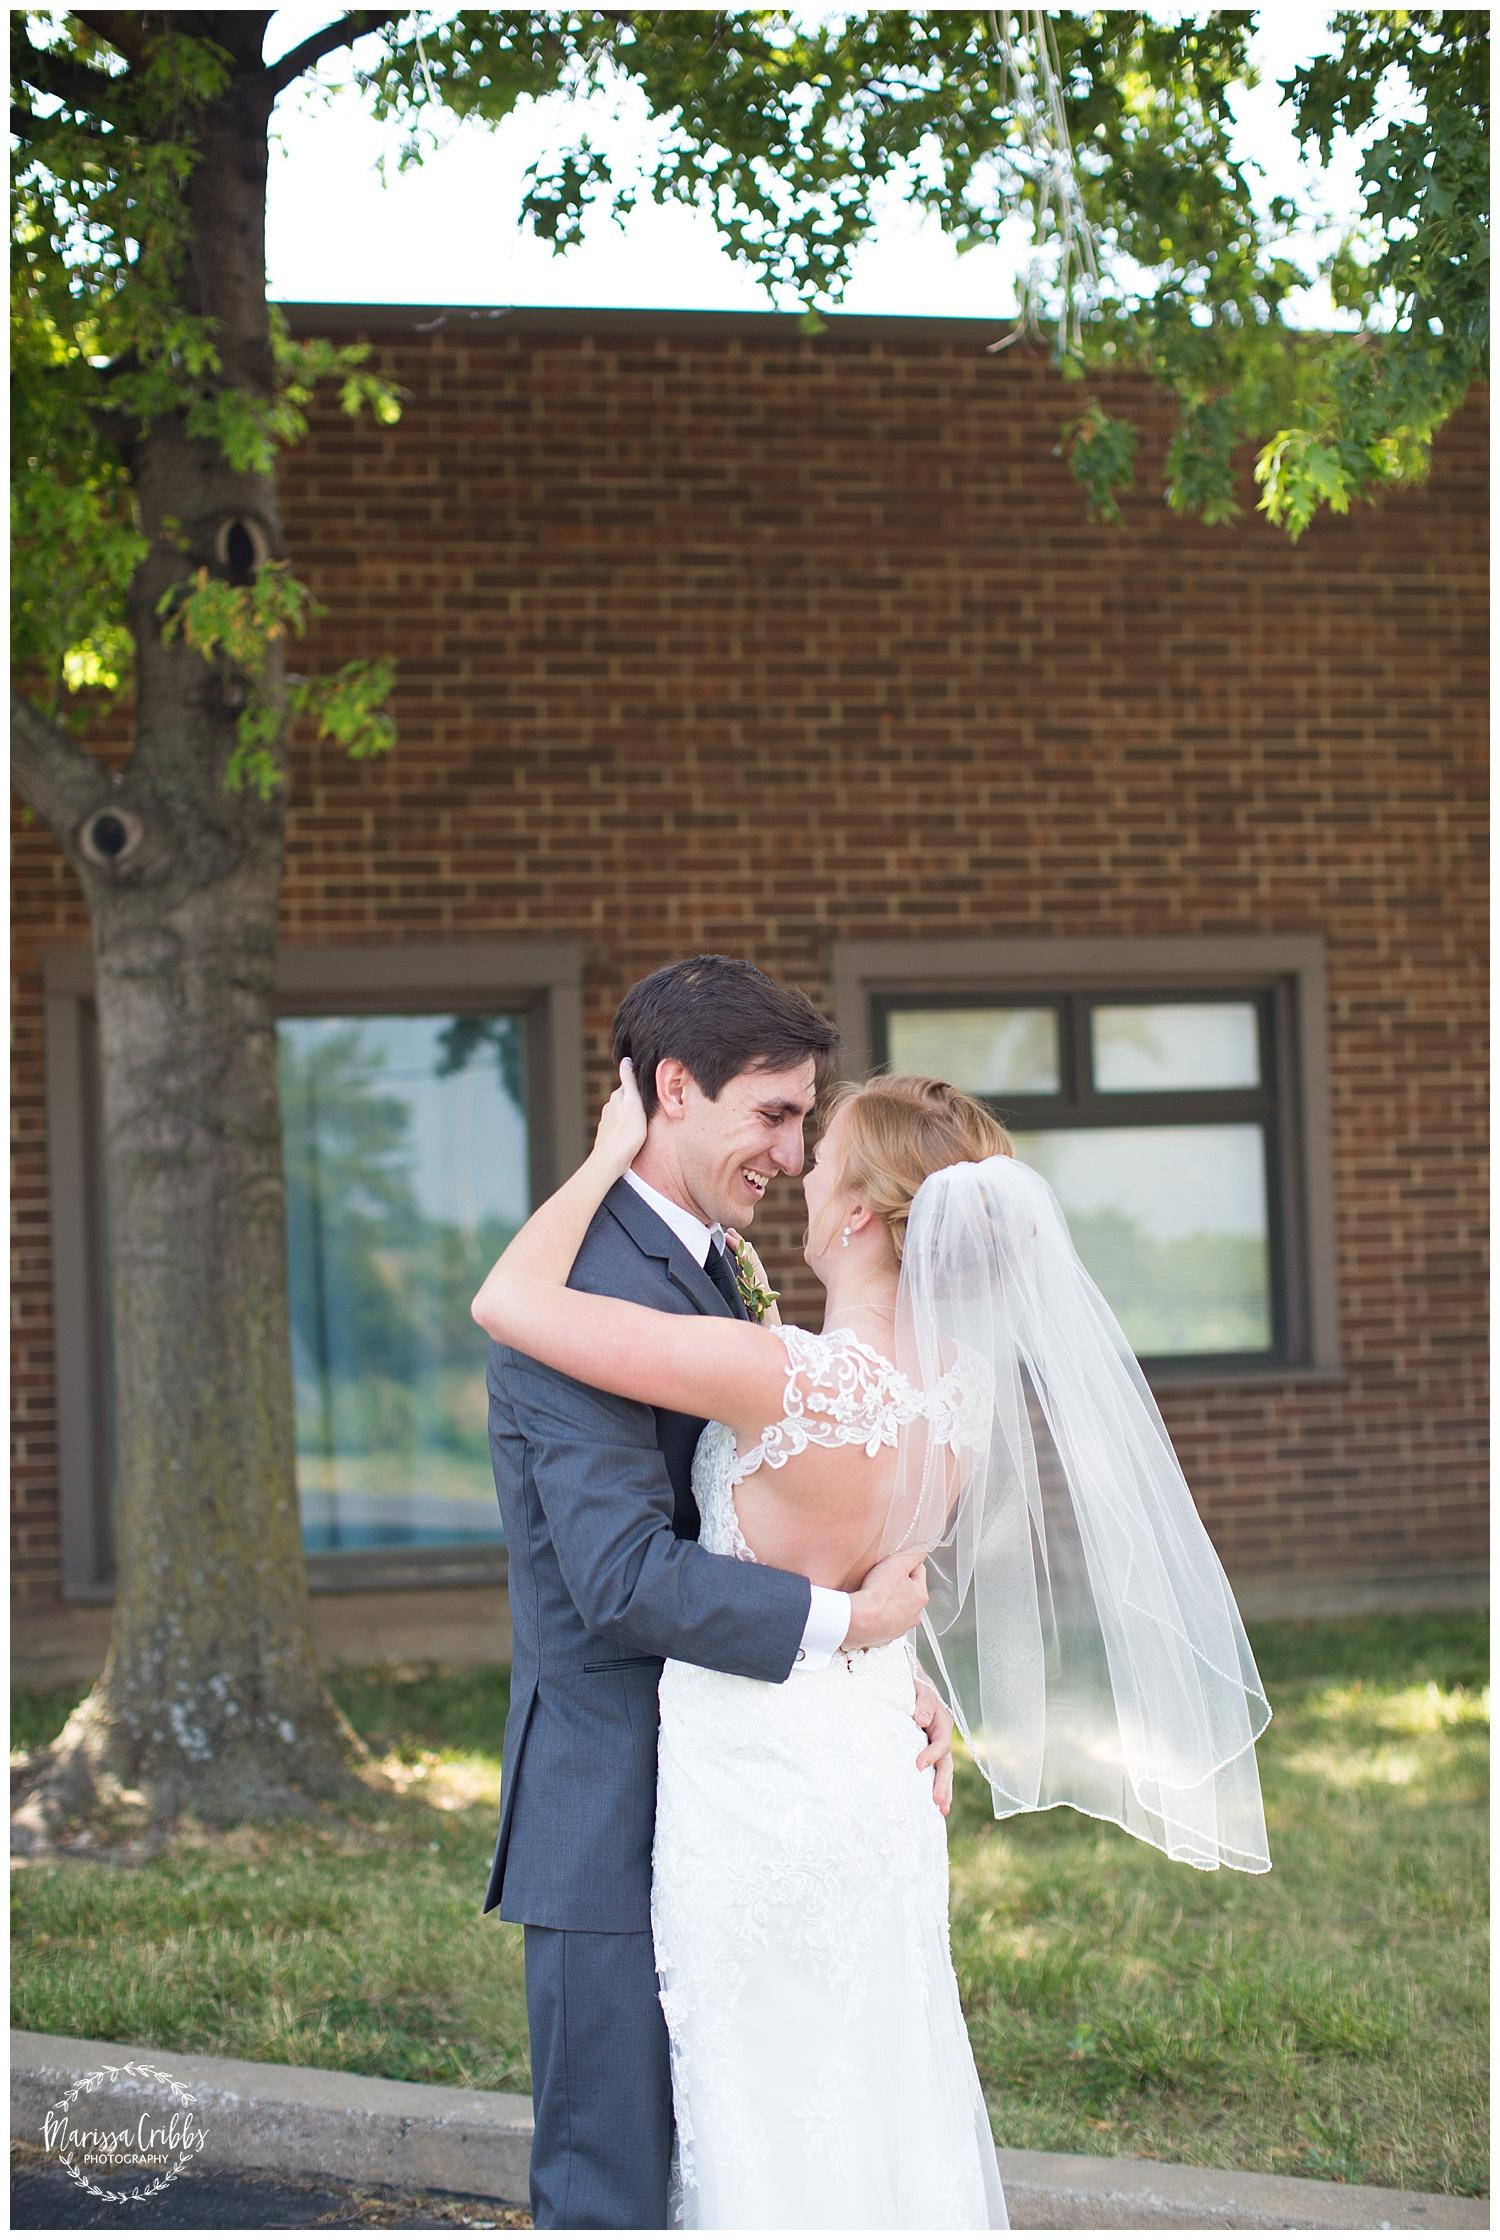 Twin Double Wedding | Union Horse Distilling Co. | Marissa Cribbs Photography | KC Weddings_0063.jpg